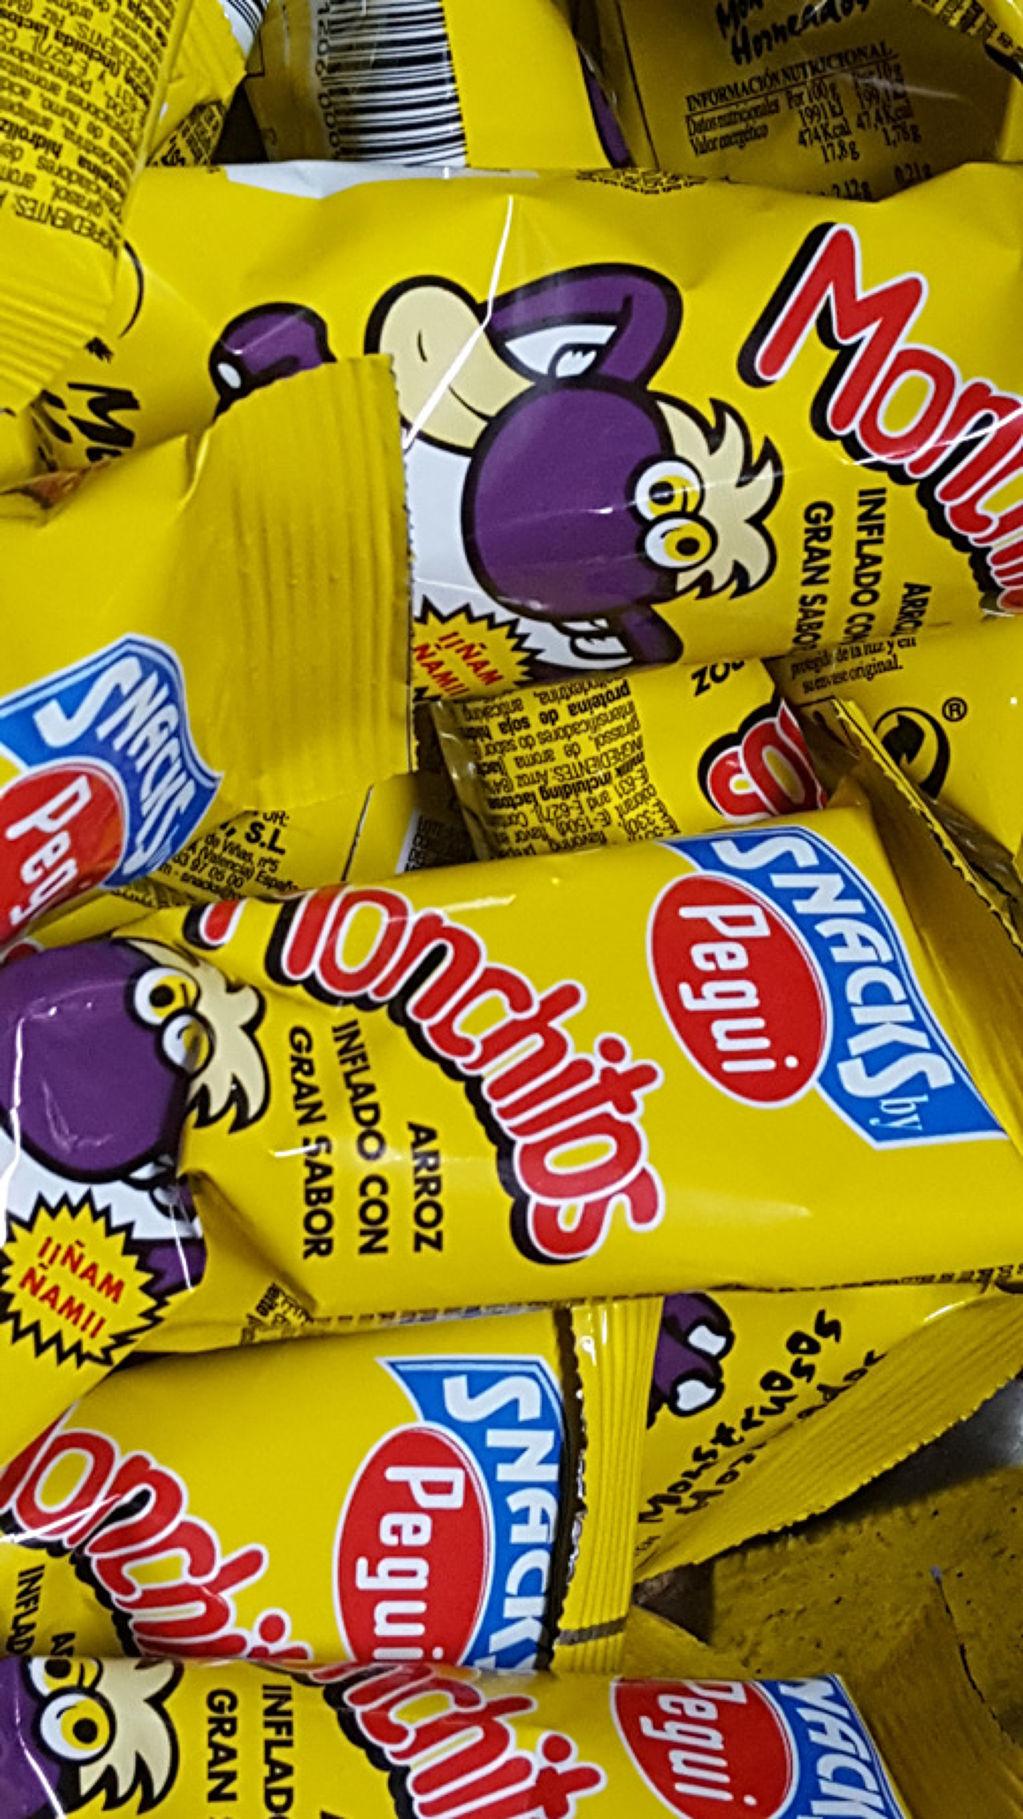 Monchitos pequeño - 55b17-20200509_083522.jpg